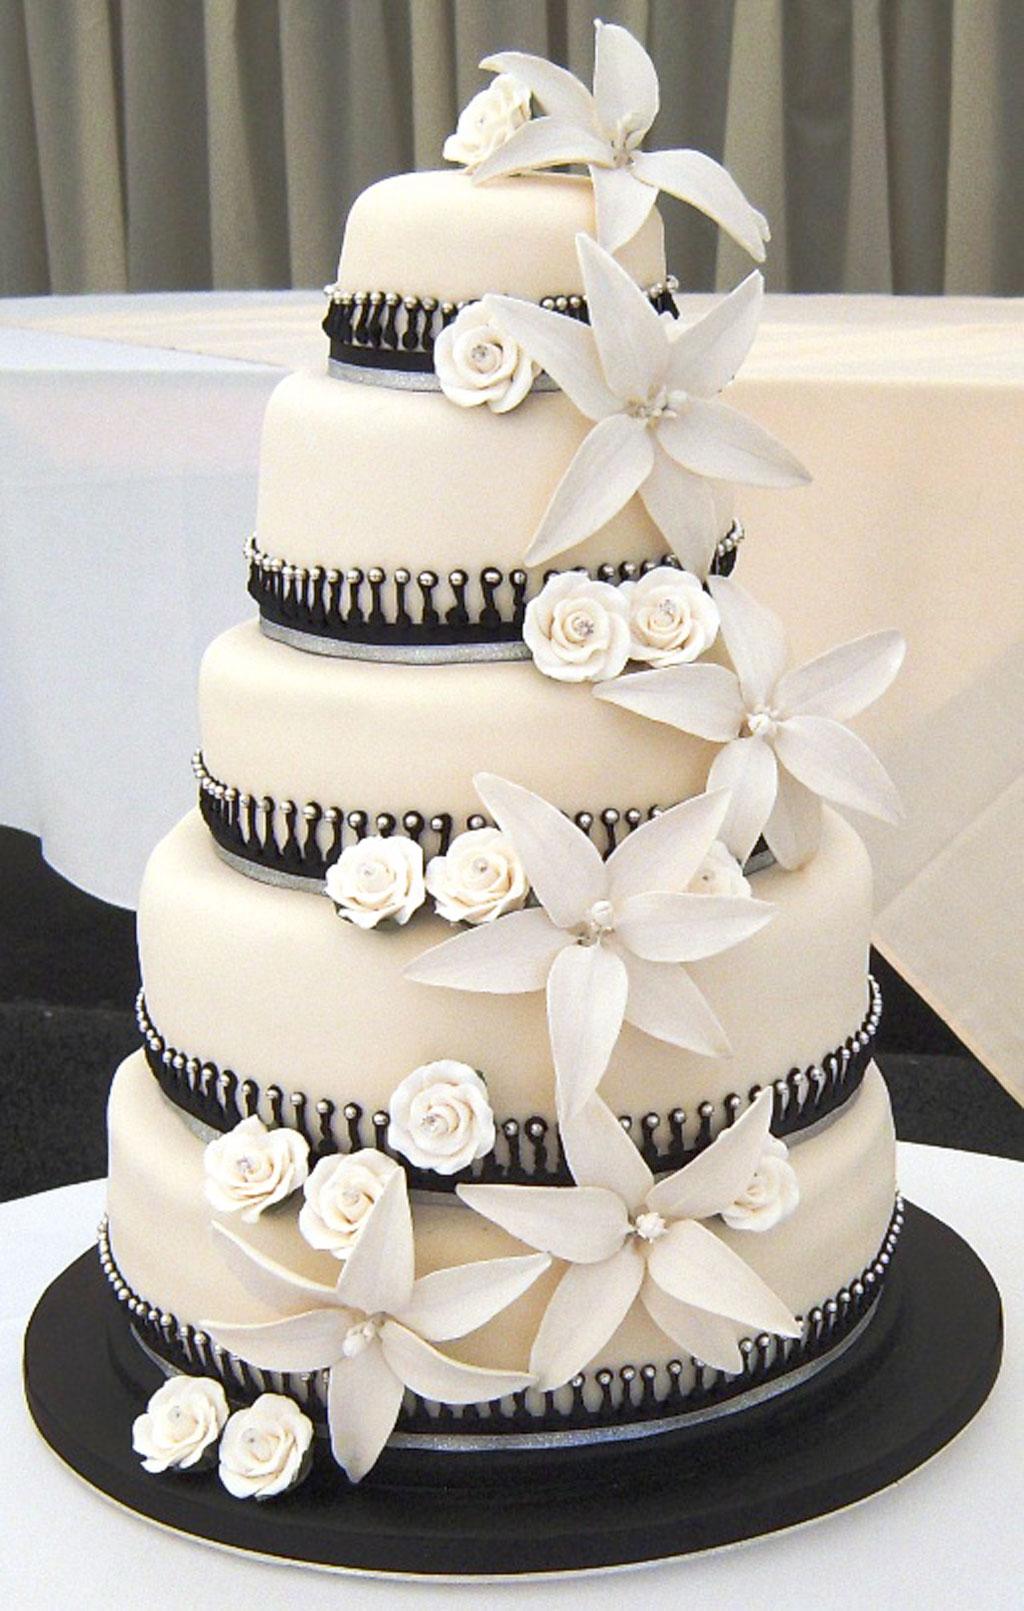 Black And White Wedding Cakes Wedding Cake - Cake Ideas by Prayface.net